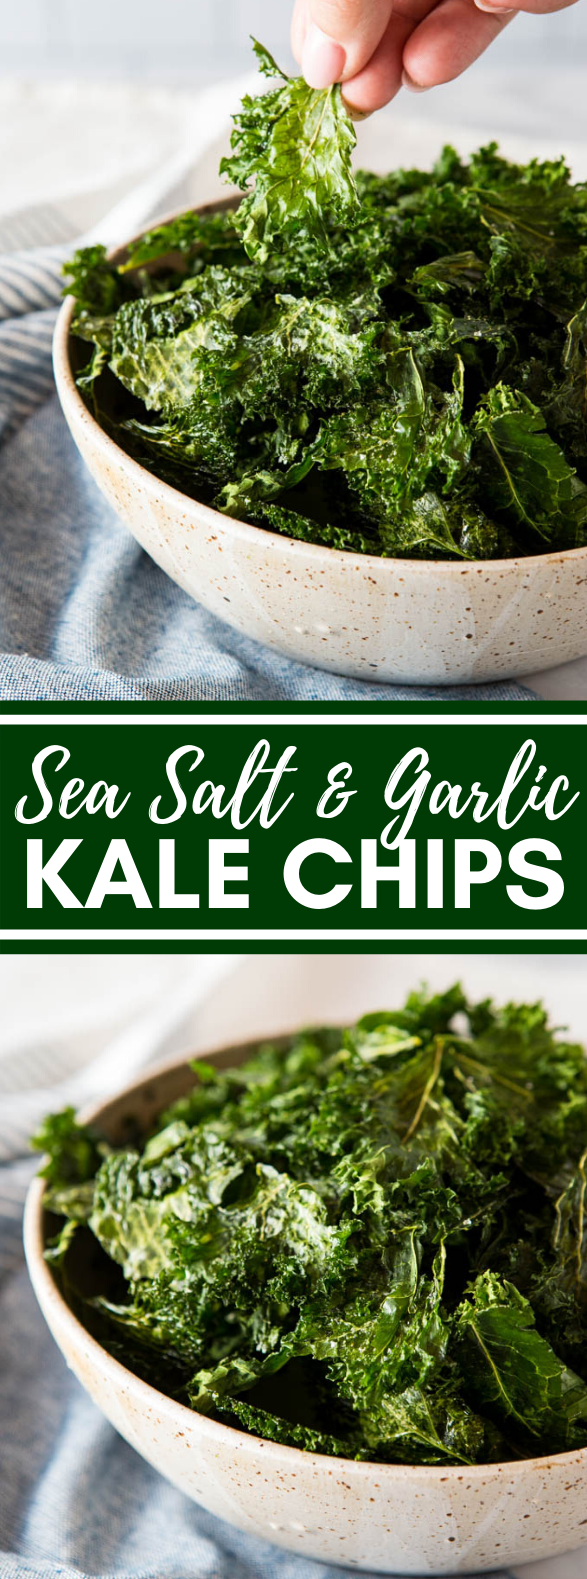 NO FAIL SEA SALT AND GARLIC KALE CHIPS #healthysnack #vegetarian